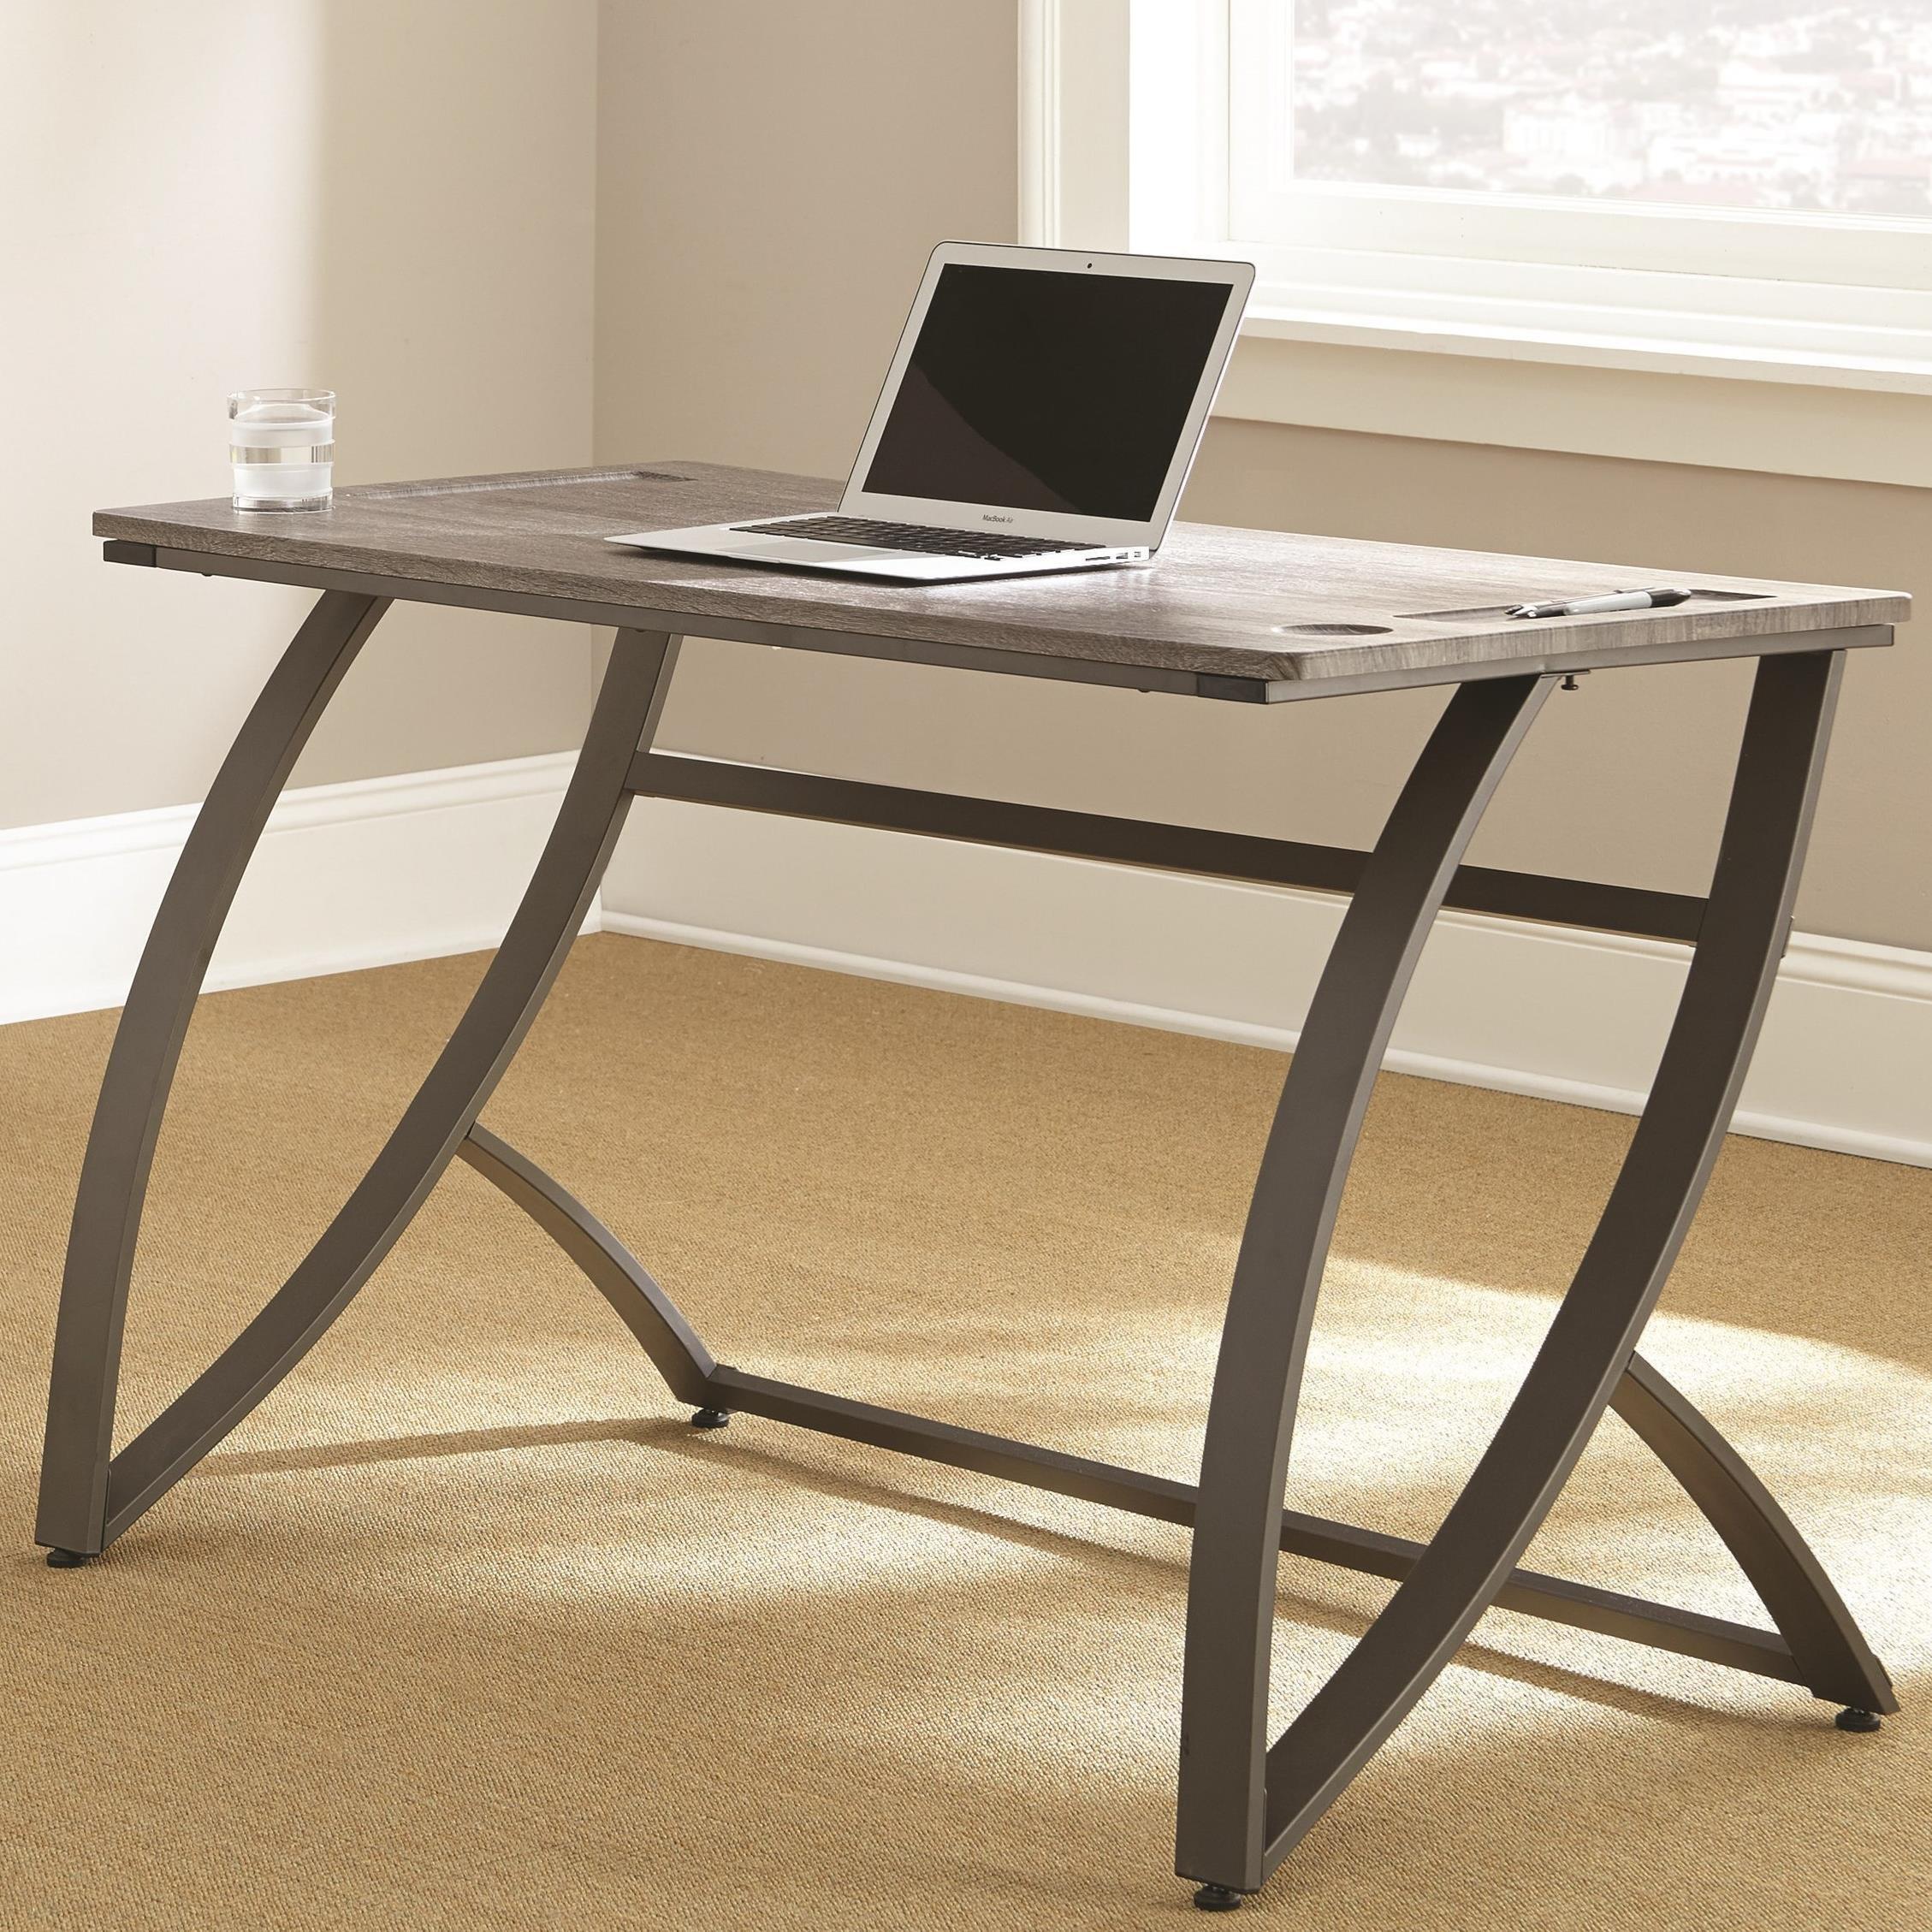 Hatfield Desk by Steve Silver at Walker's Furniture